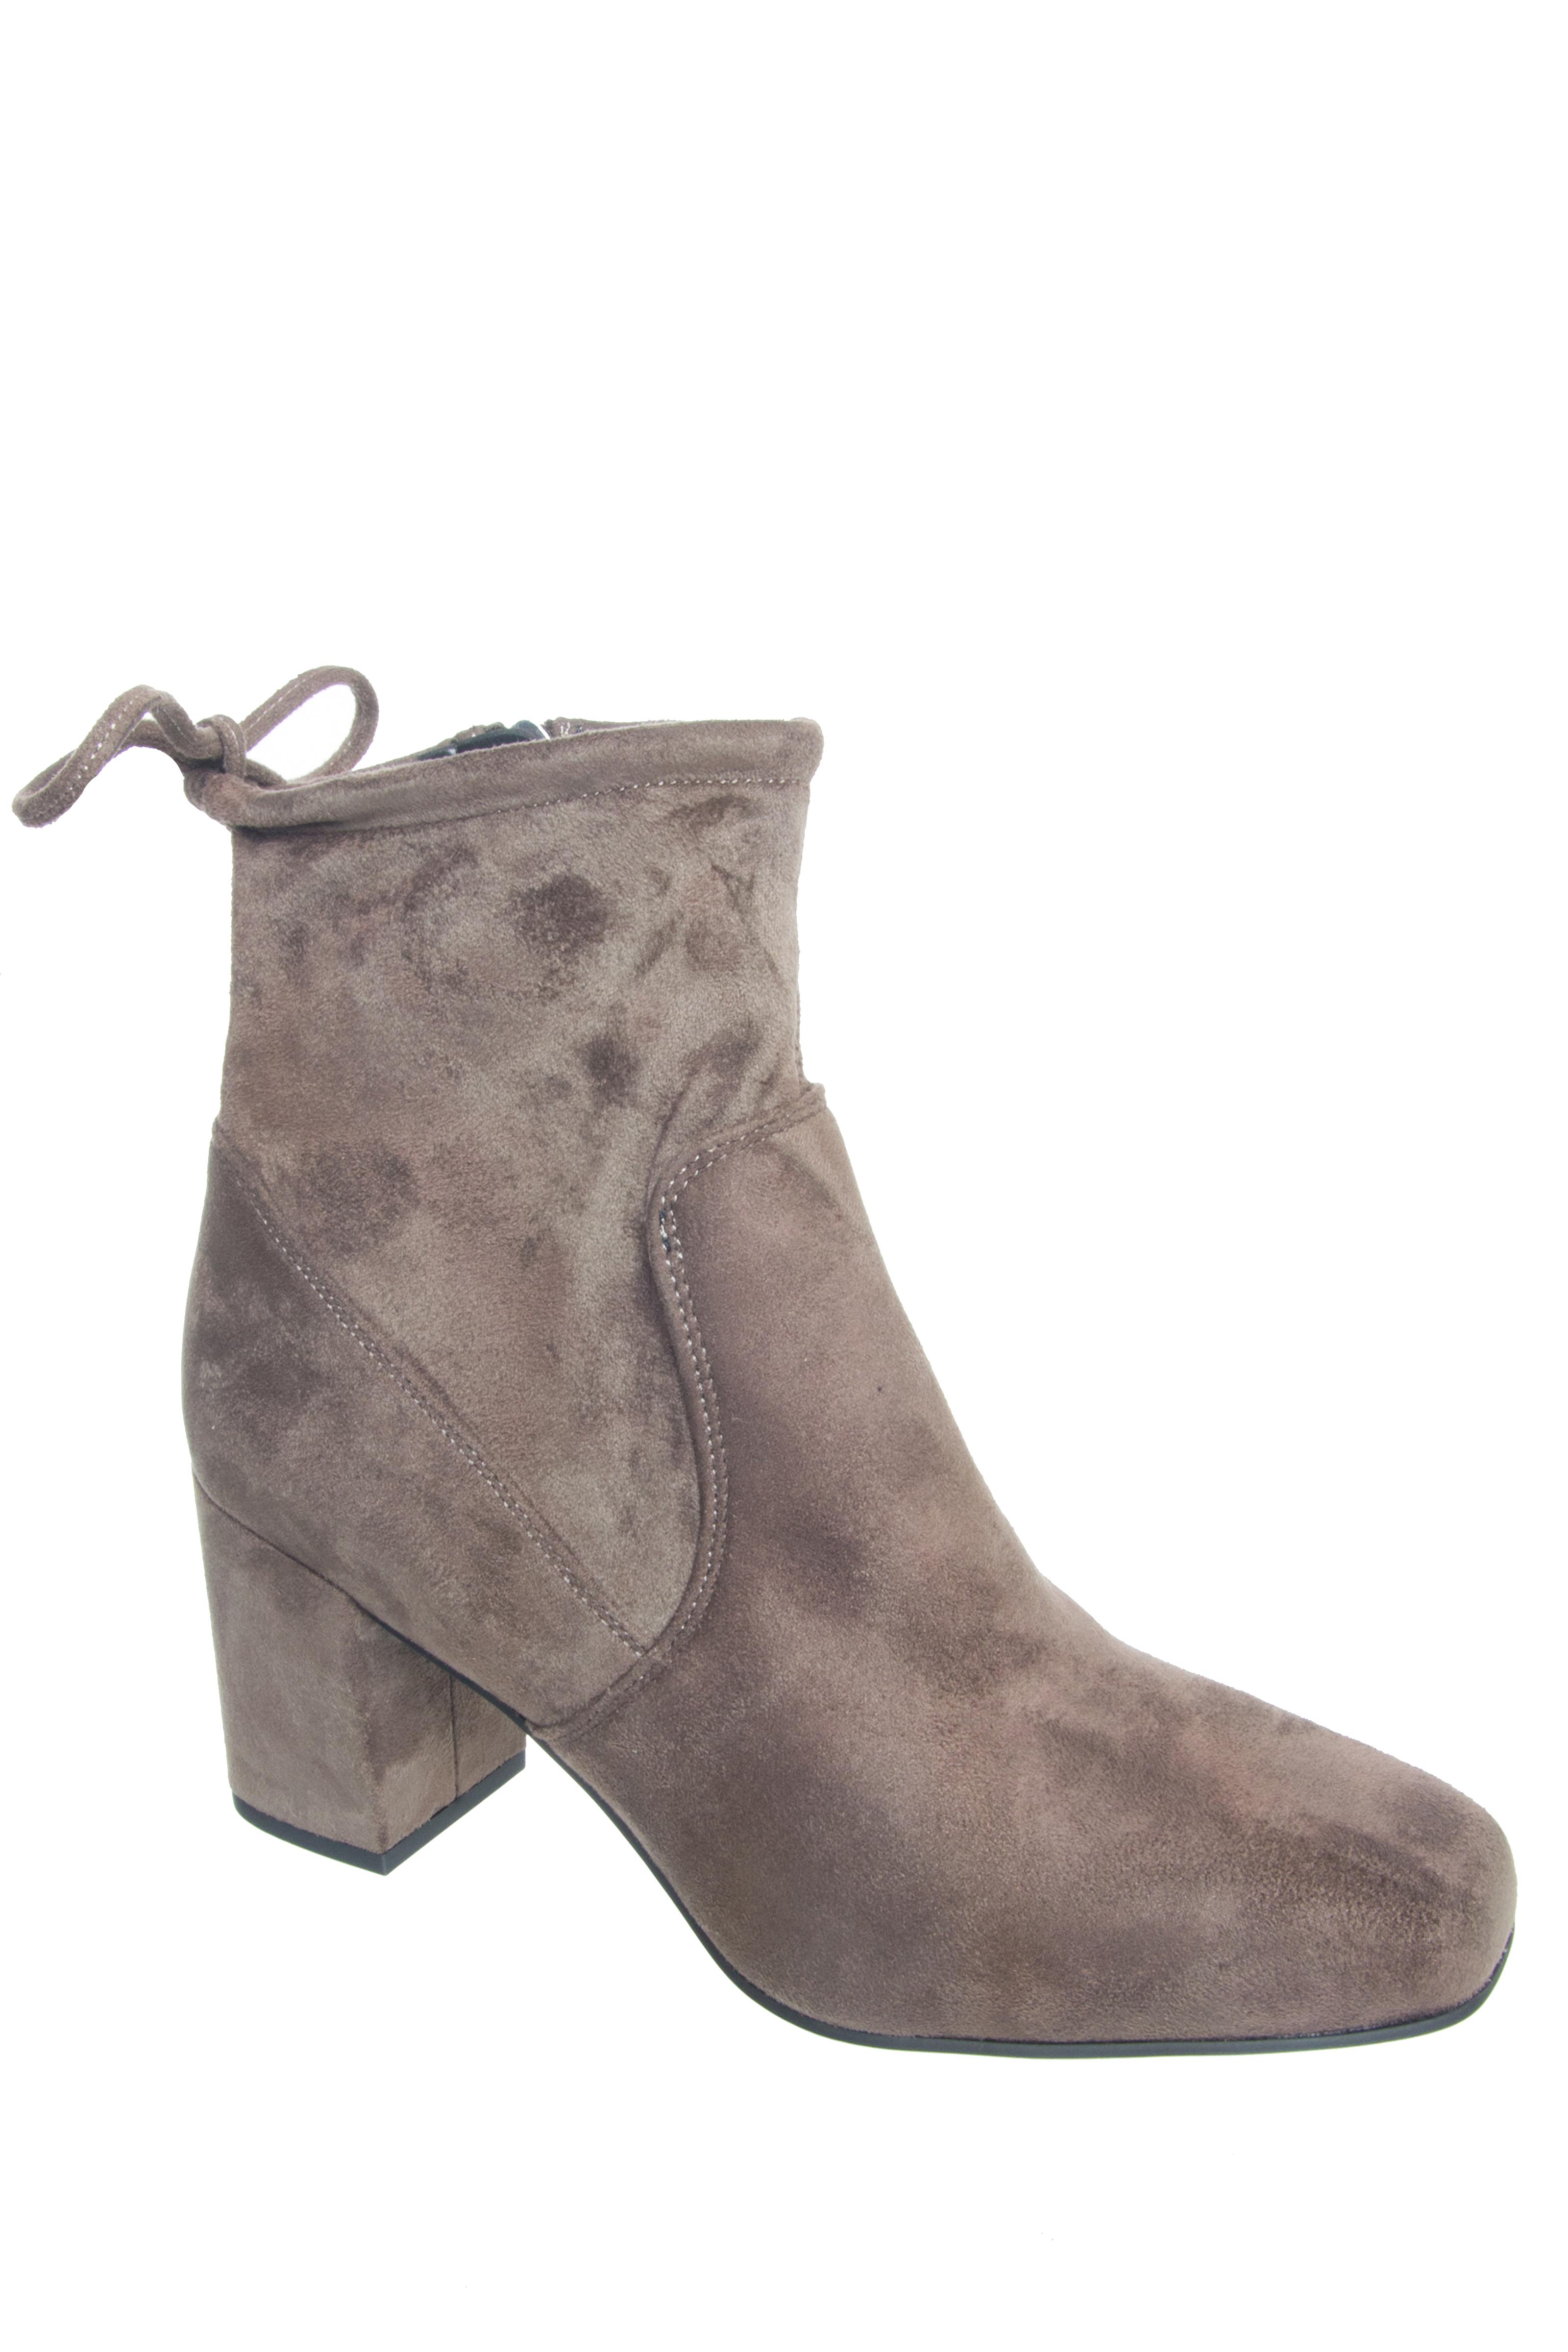 Franco Sarto Pisces Mid Heel Booties - Taupe